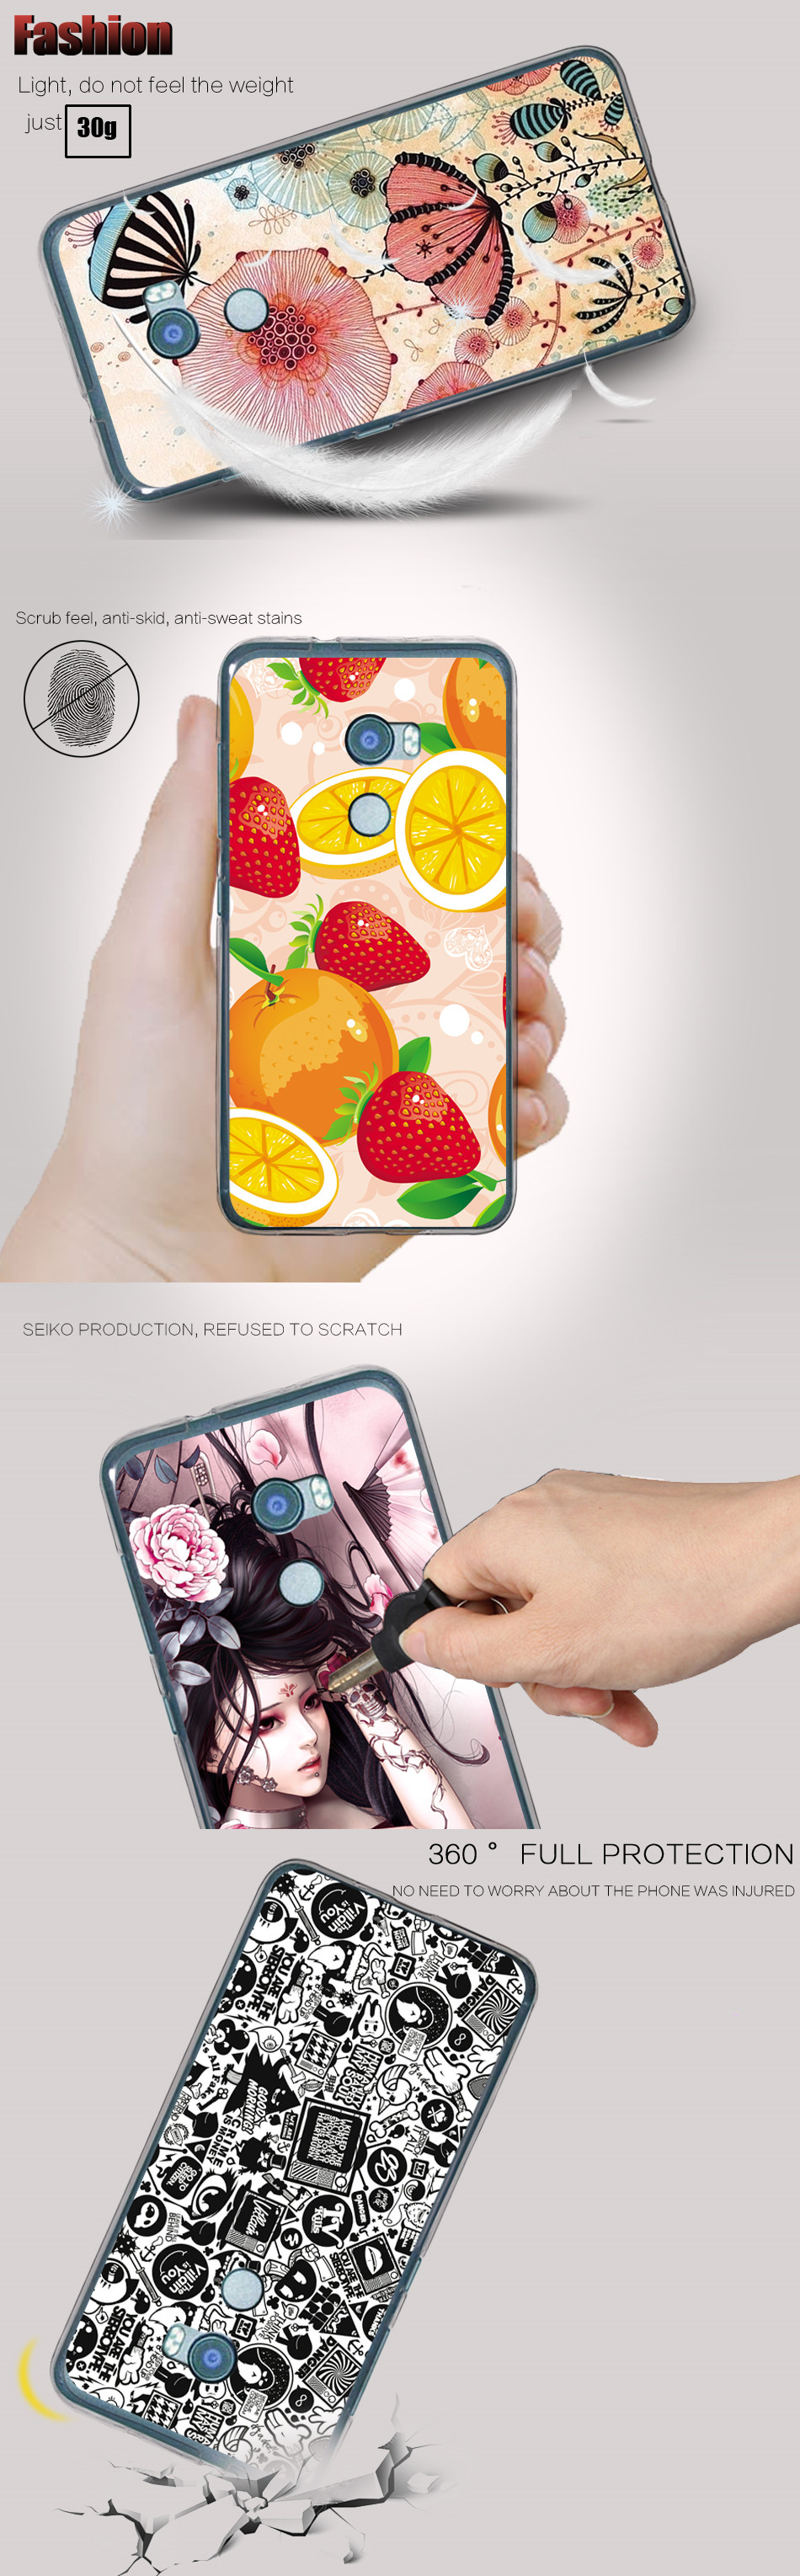 "Soft TPU For Coque HTC One X10 Case Cover Cute Cartoon UV Printing Phone Cases For HTC One X10 E66 Funda Capa For HTC X10 5.5"" 1"